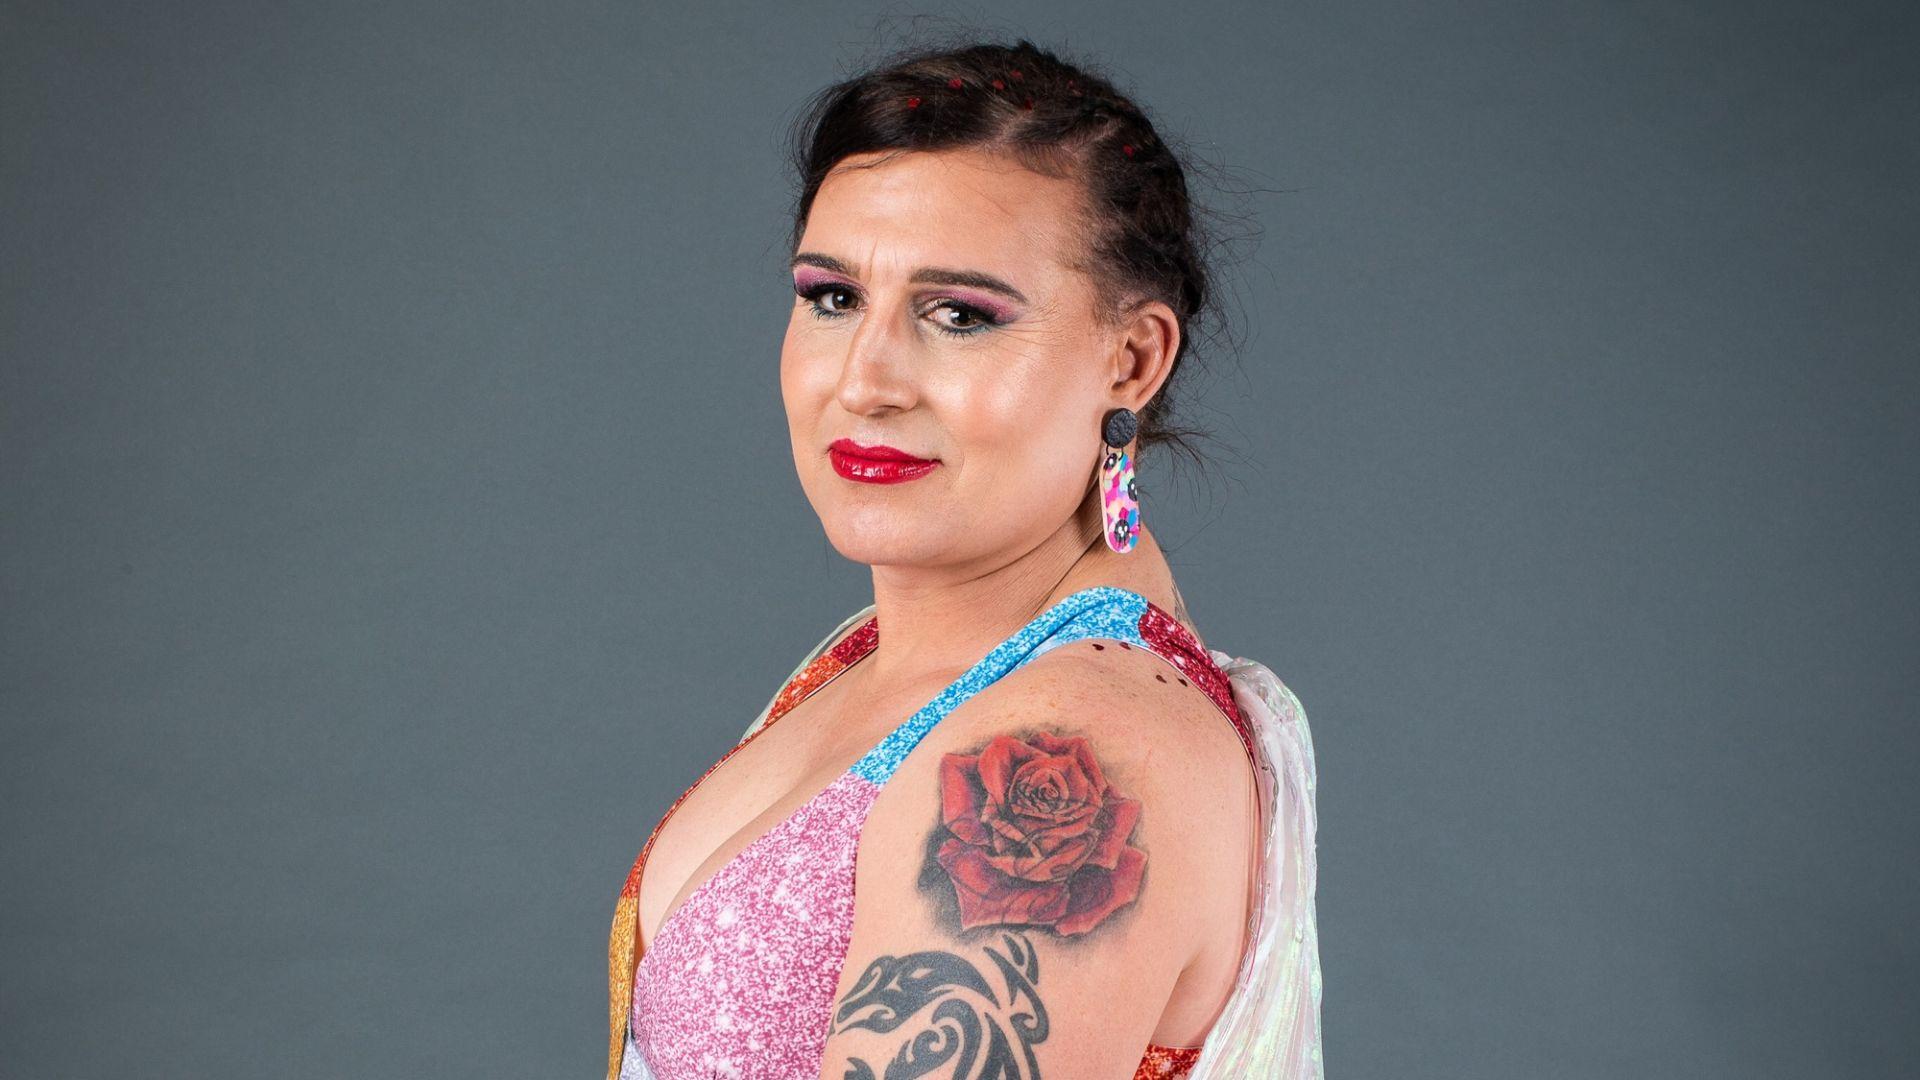 Charles Sturt to host documentary screening for Transgender Awareness Week